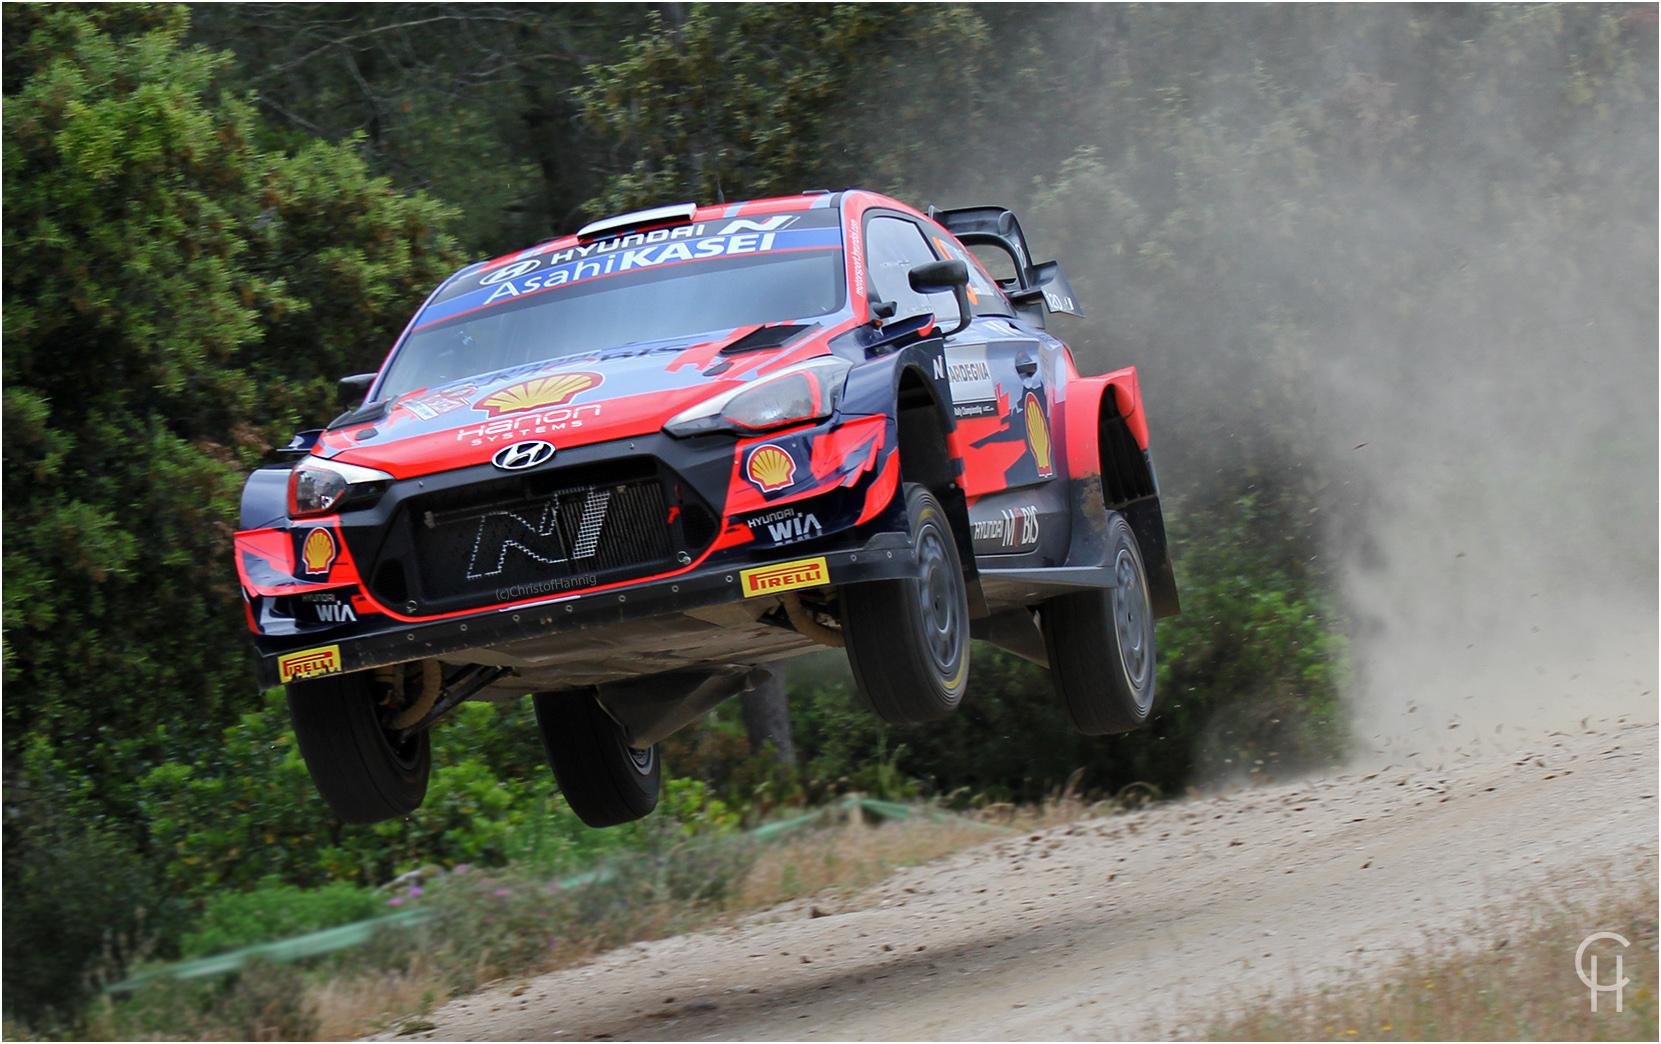 Ott Tänak - WRC Rally Italia Sardegna 2021 - Hyundai i20 N WRC